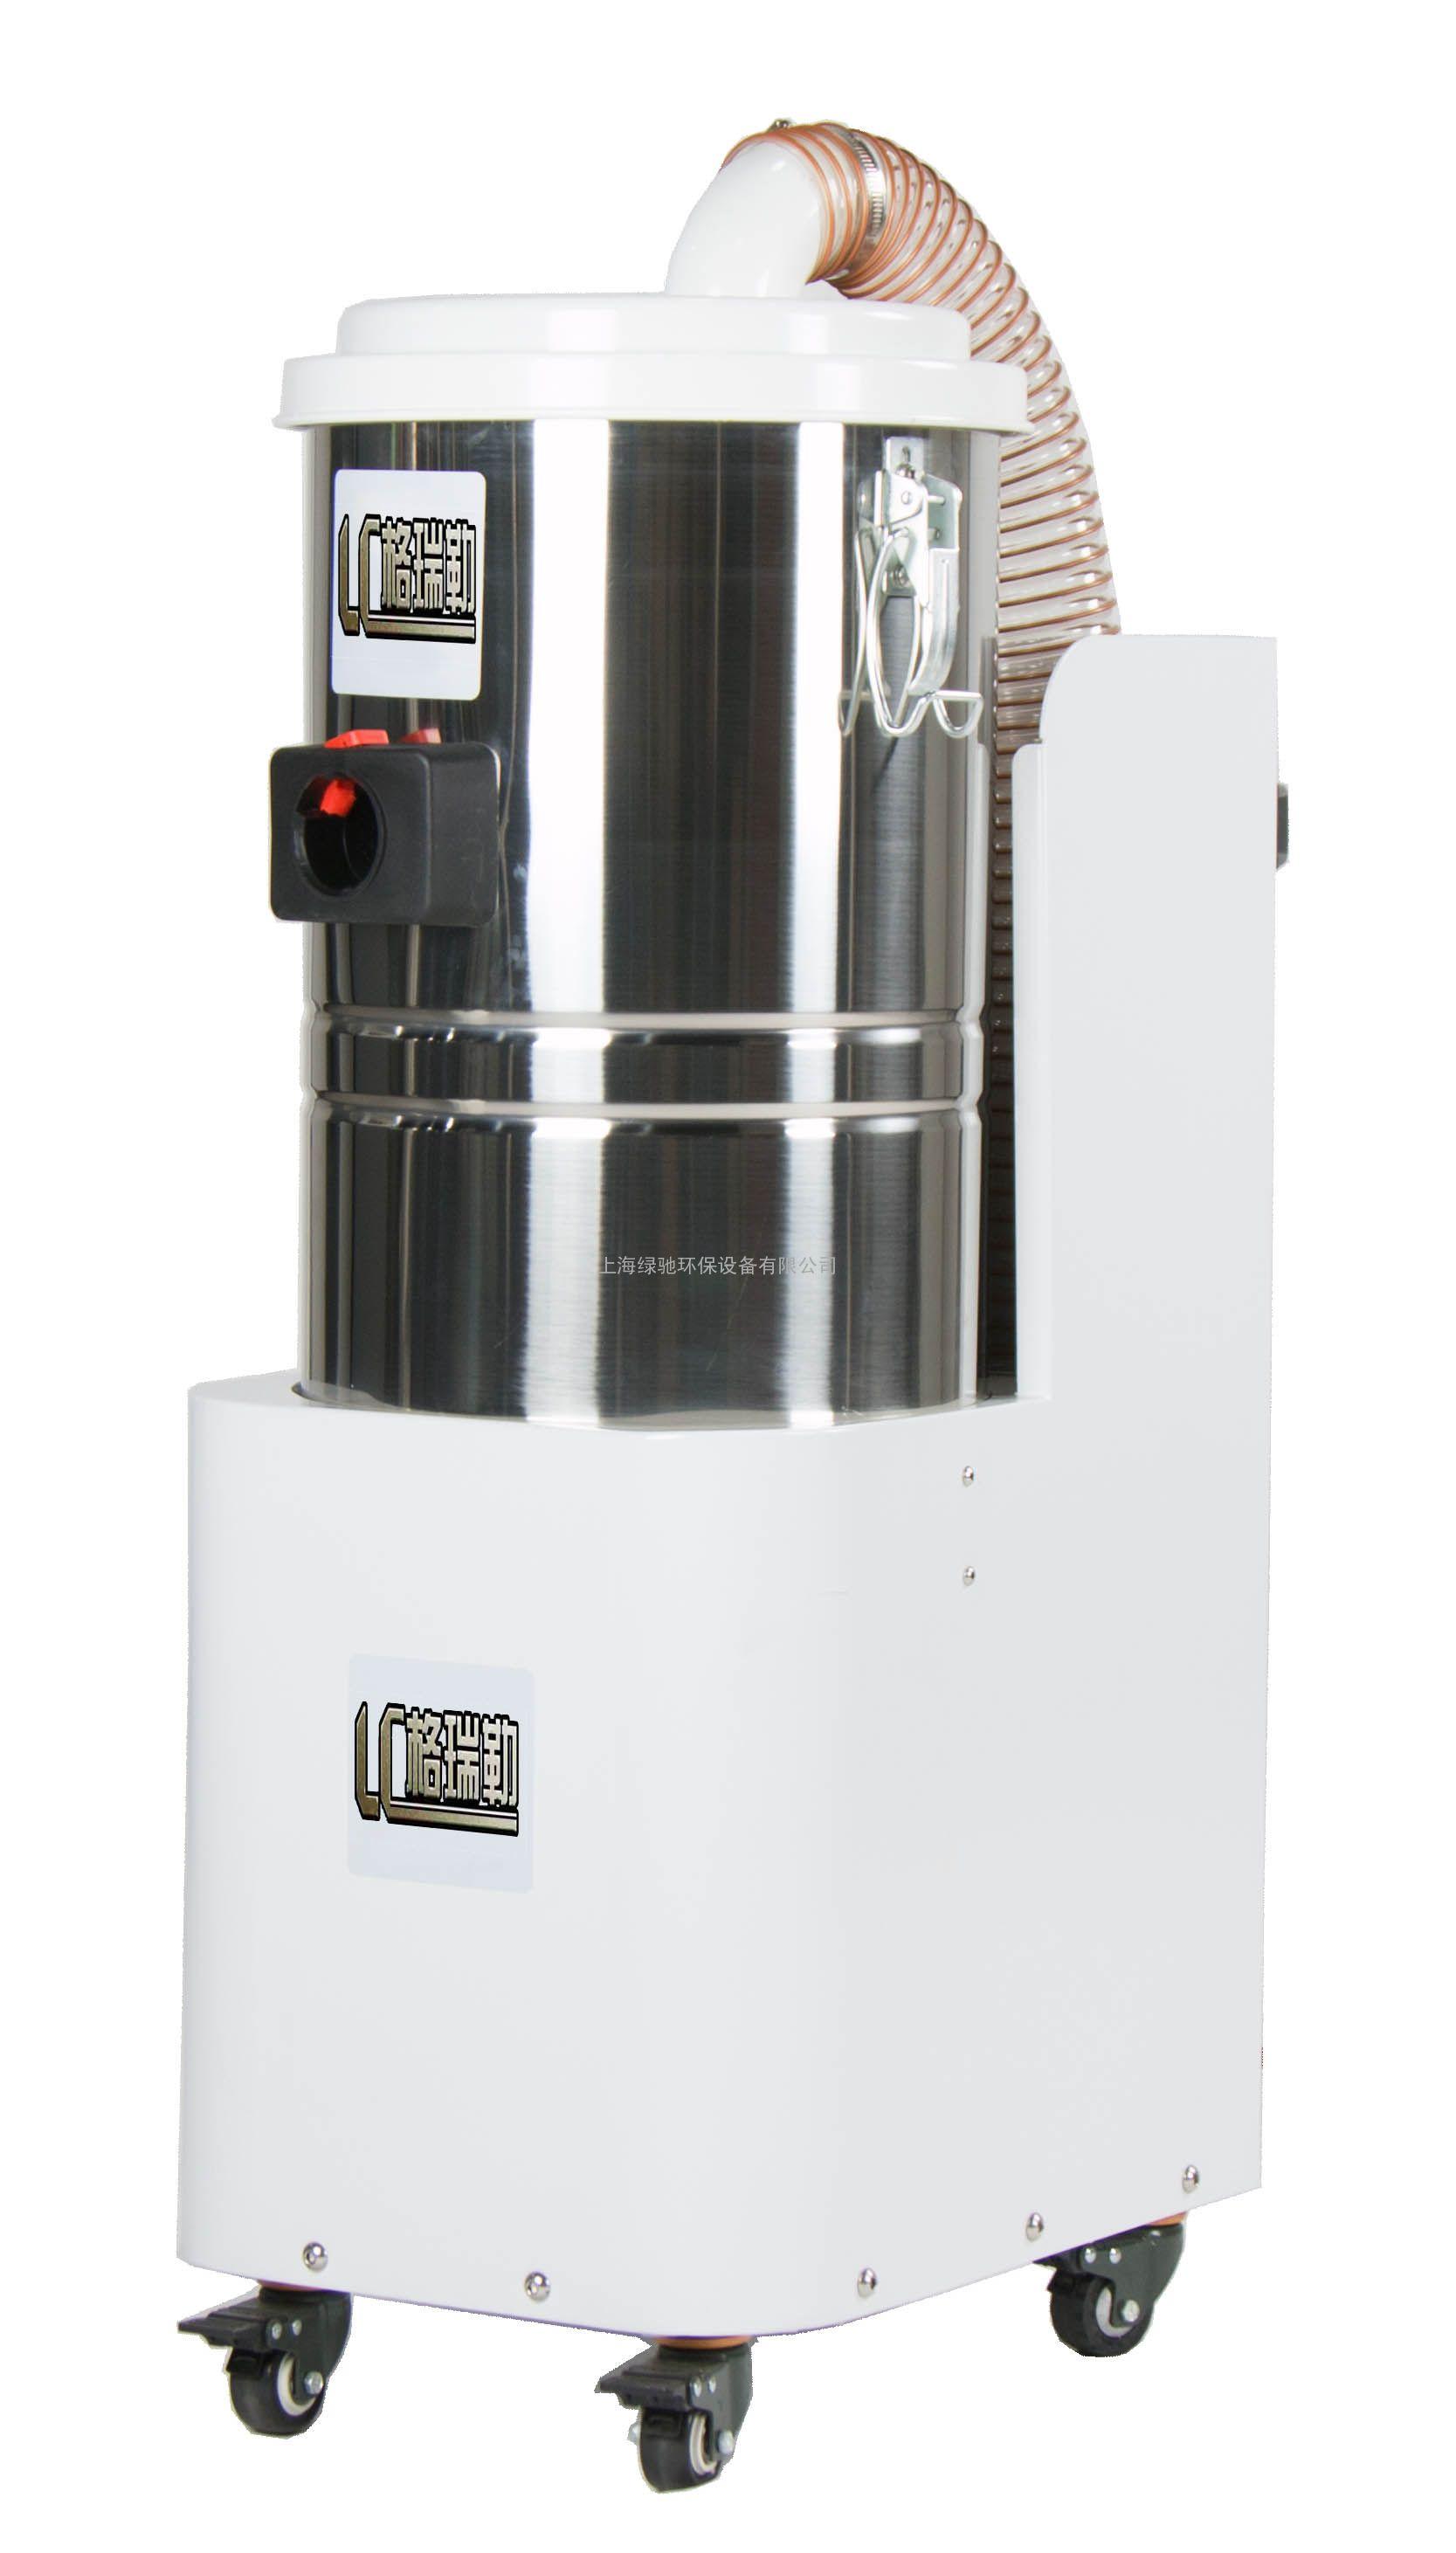 GV系列工业吸尘器应用于电子、医药、食品、精细化工等场合。